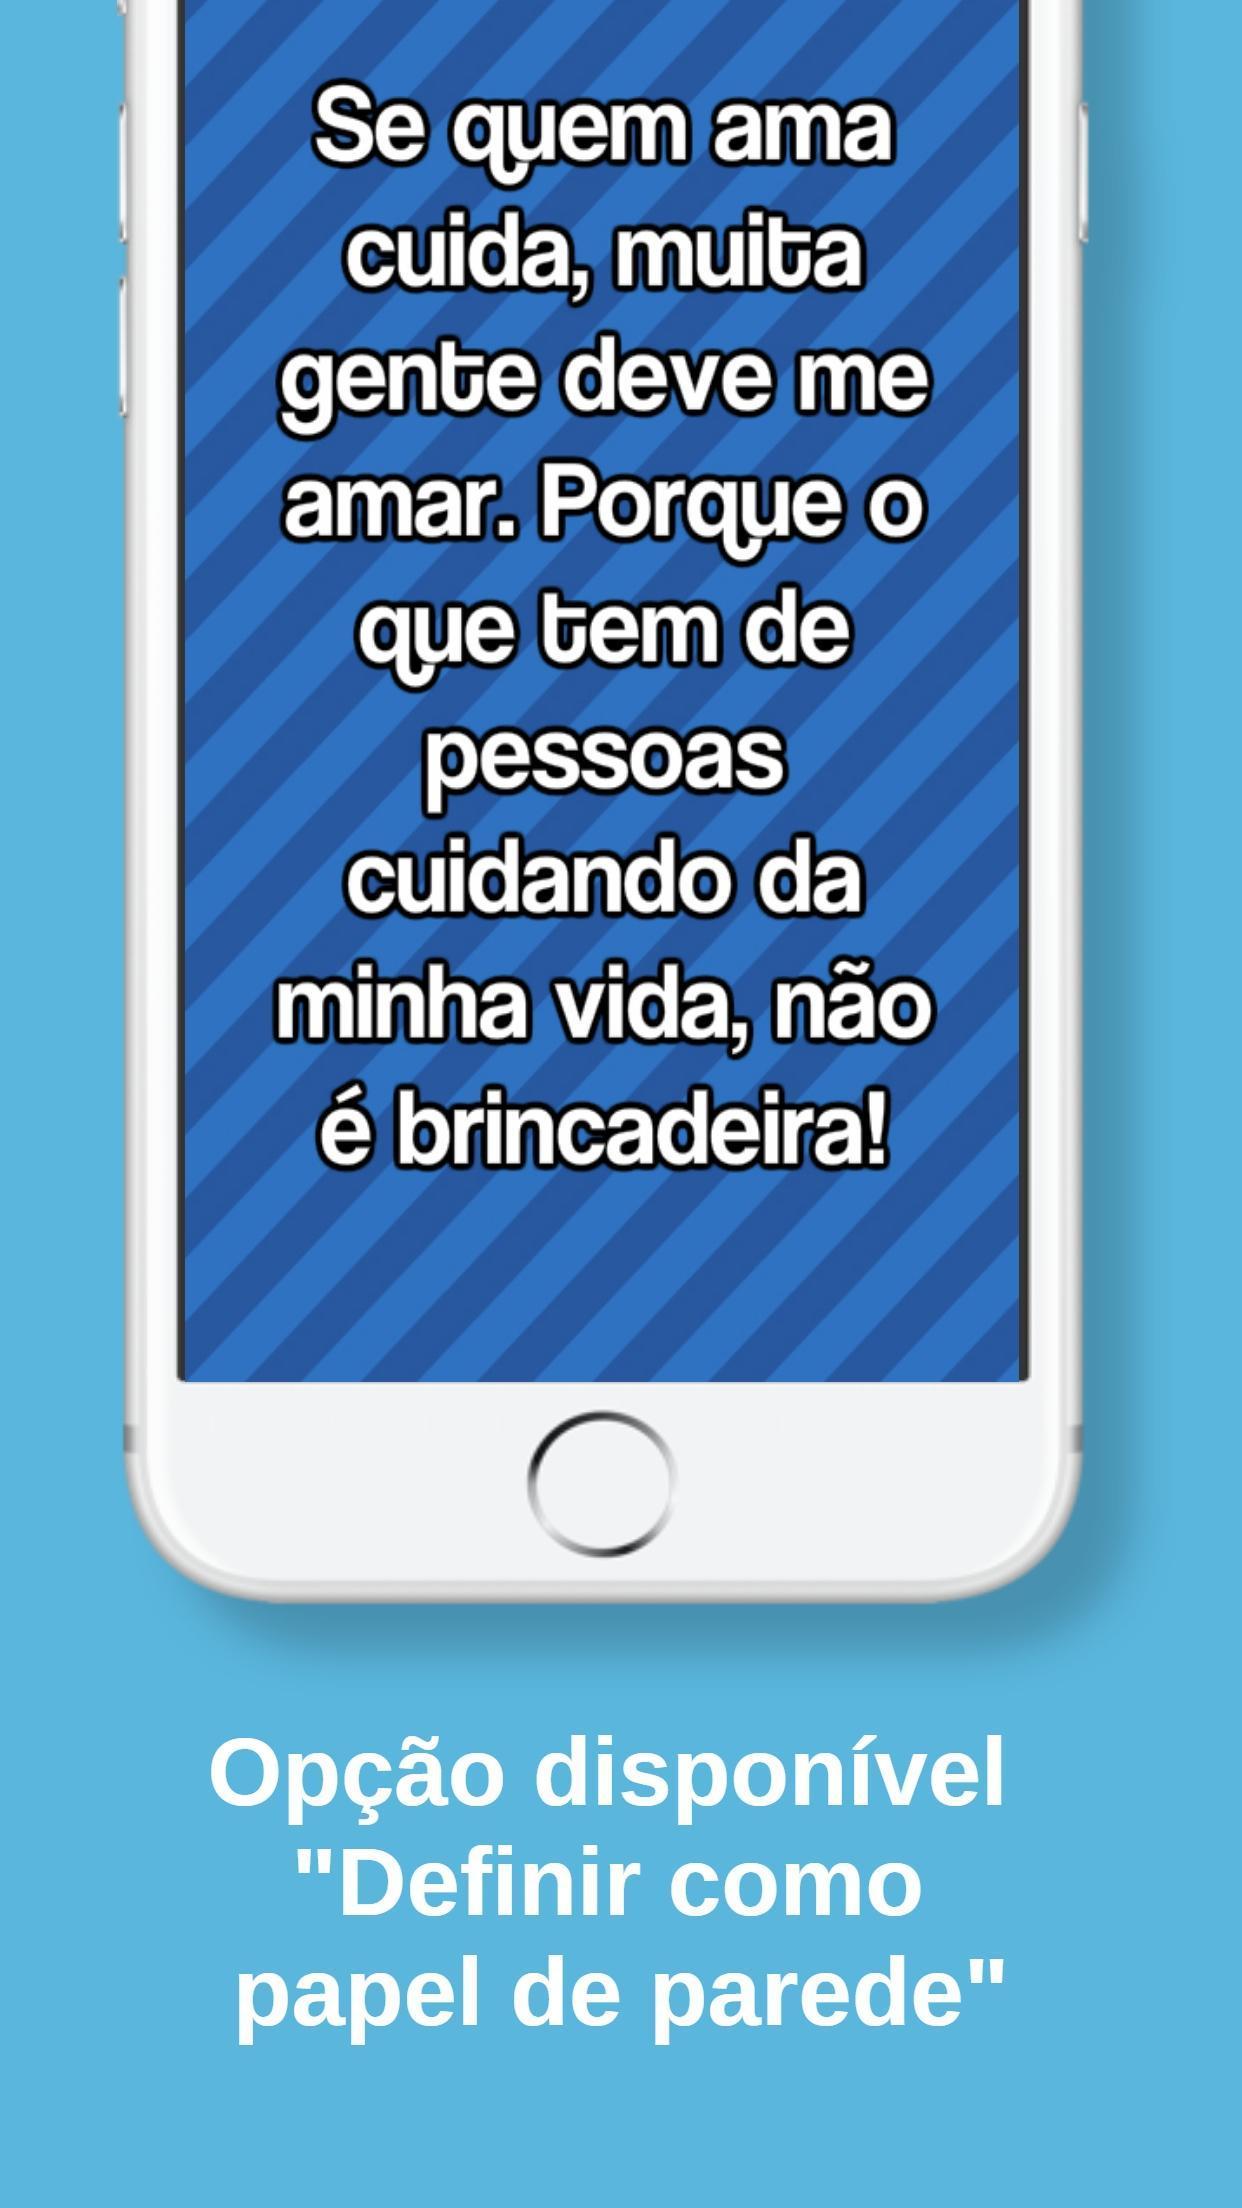 Frases De Vida For Android Apk Download